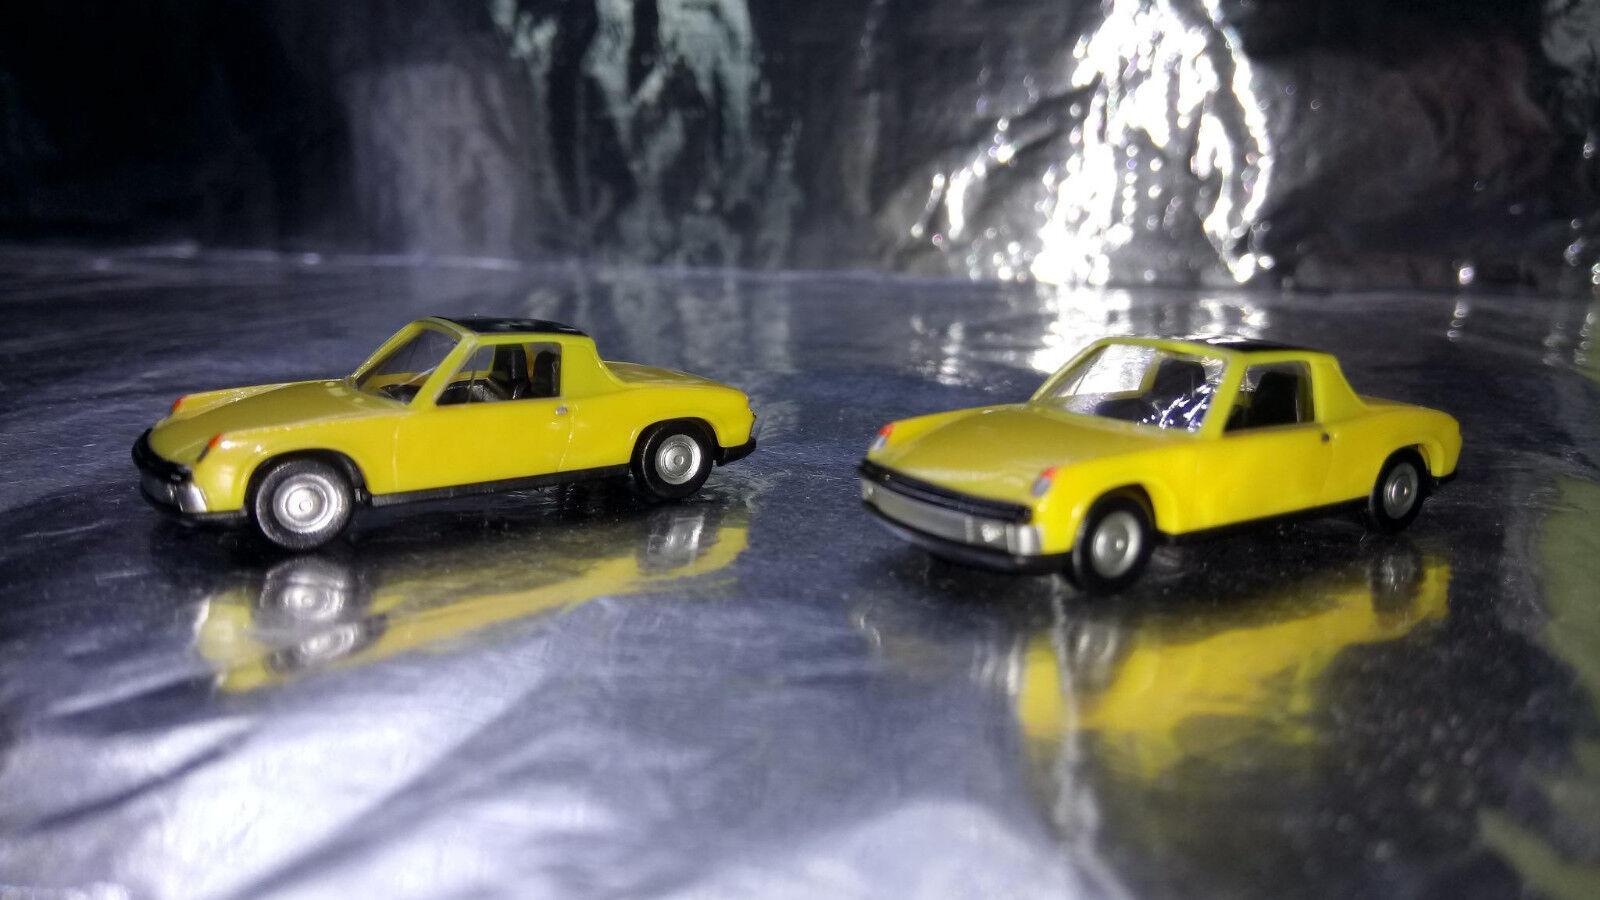 * Herpa Herpa Herpa 451611Y Vw Porsche 914 Amarillo 2 Car Pack 1 87 HO Scale d5de01